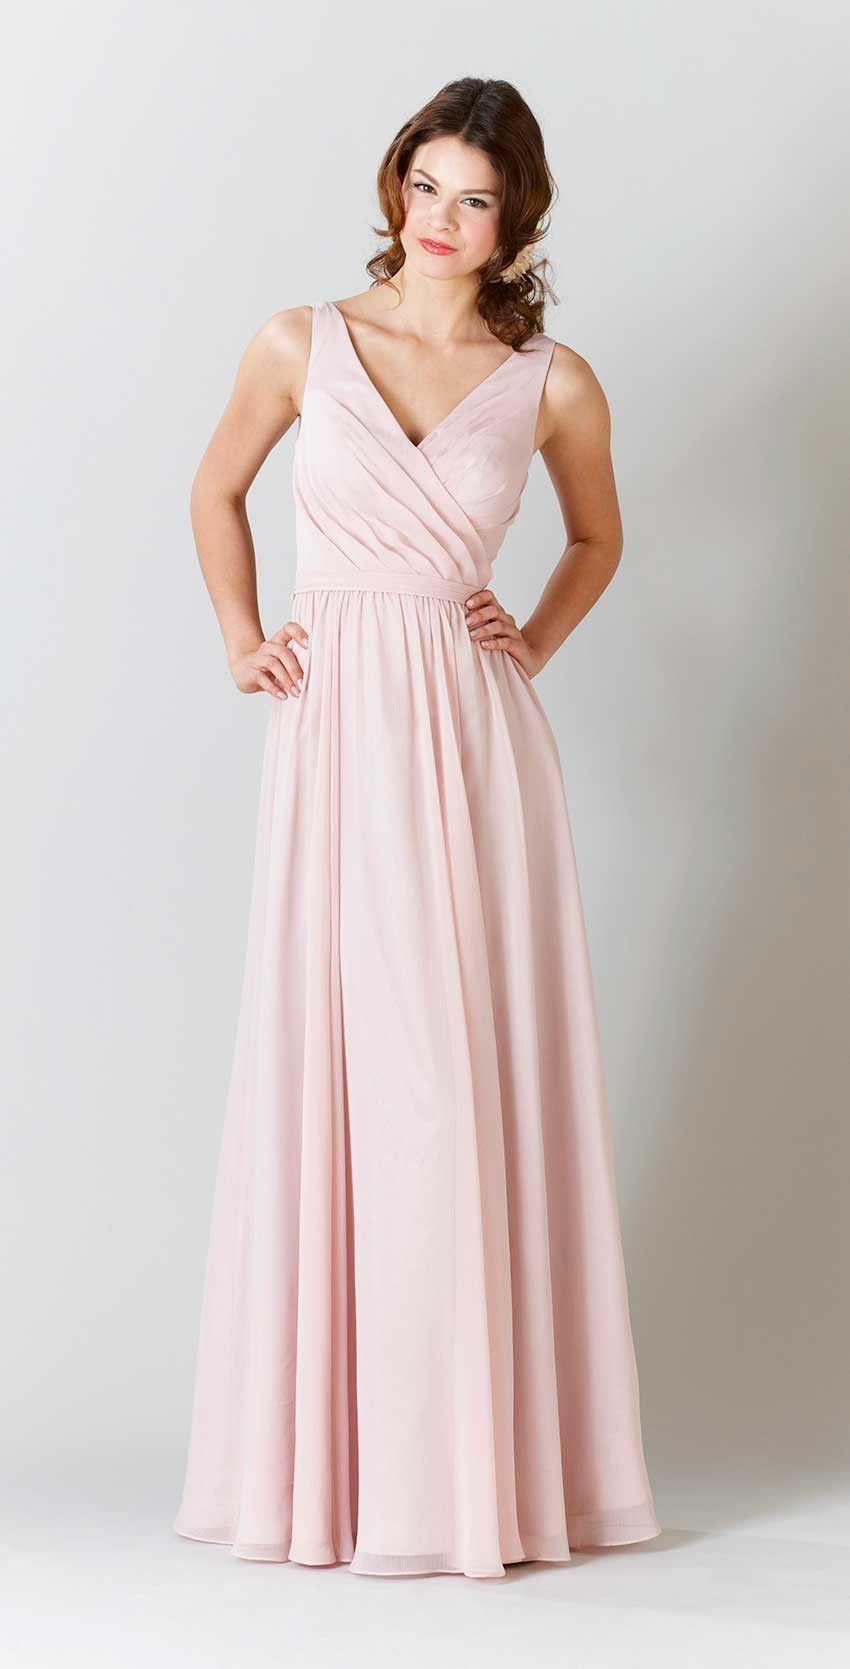 Anna chiffon bridesmaid dresses bridal parties and wedding stuff anna slate blue bridesmaid dressesblush ombrellifo Images